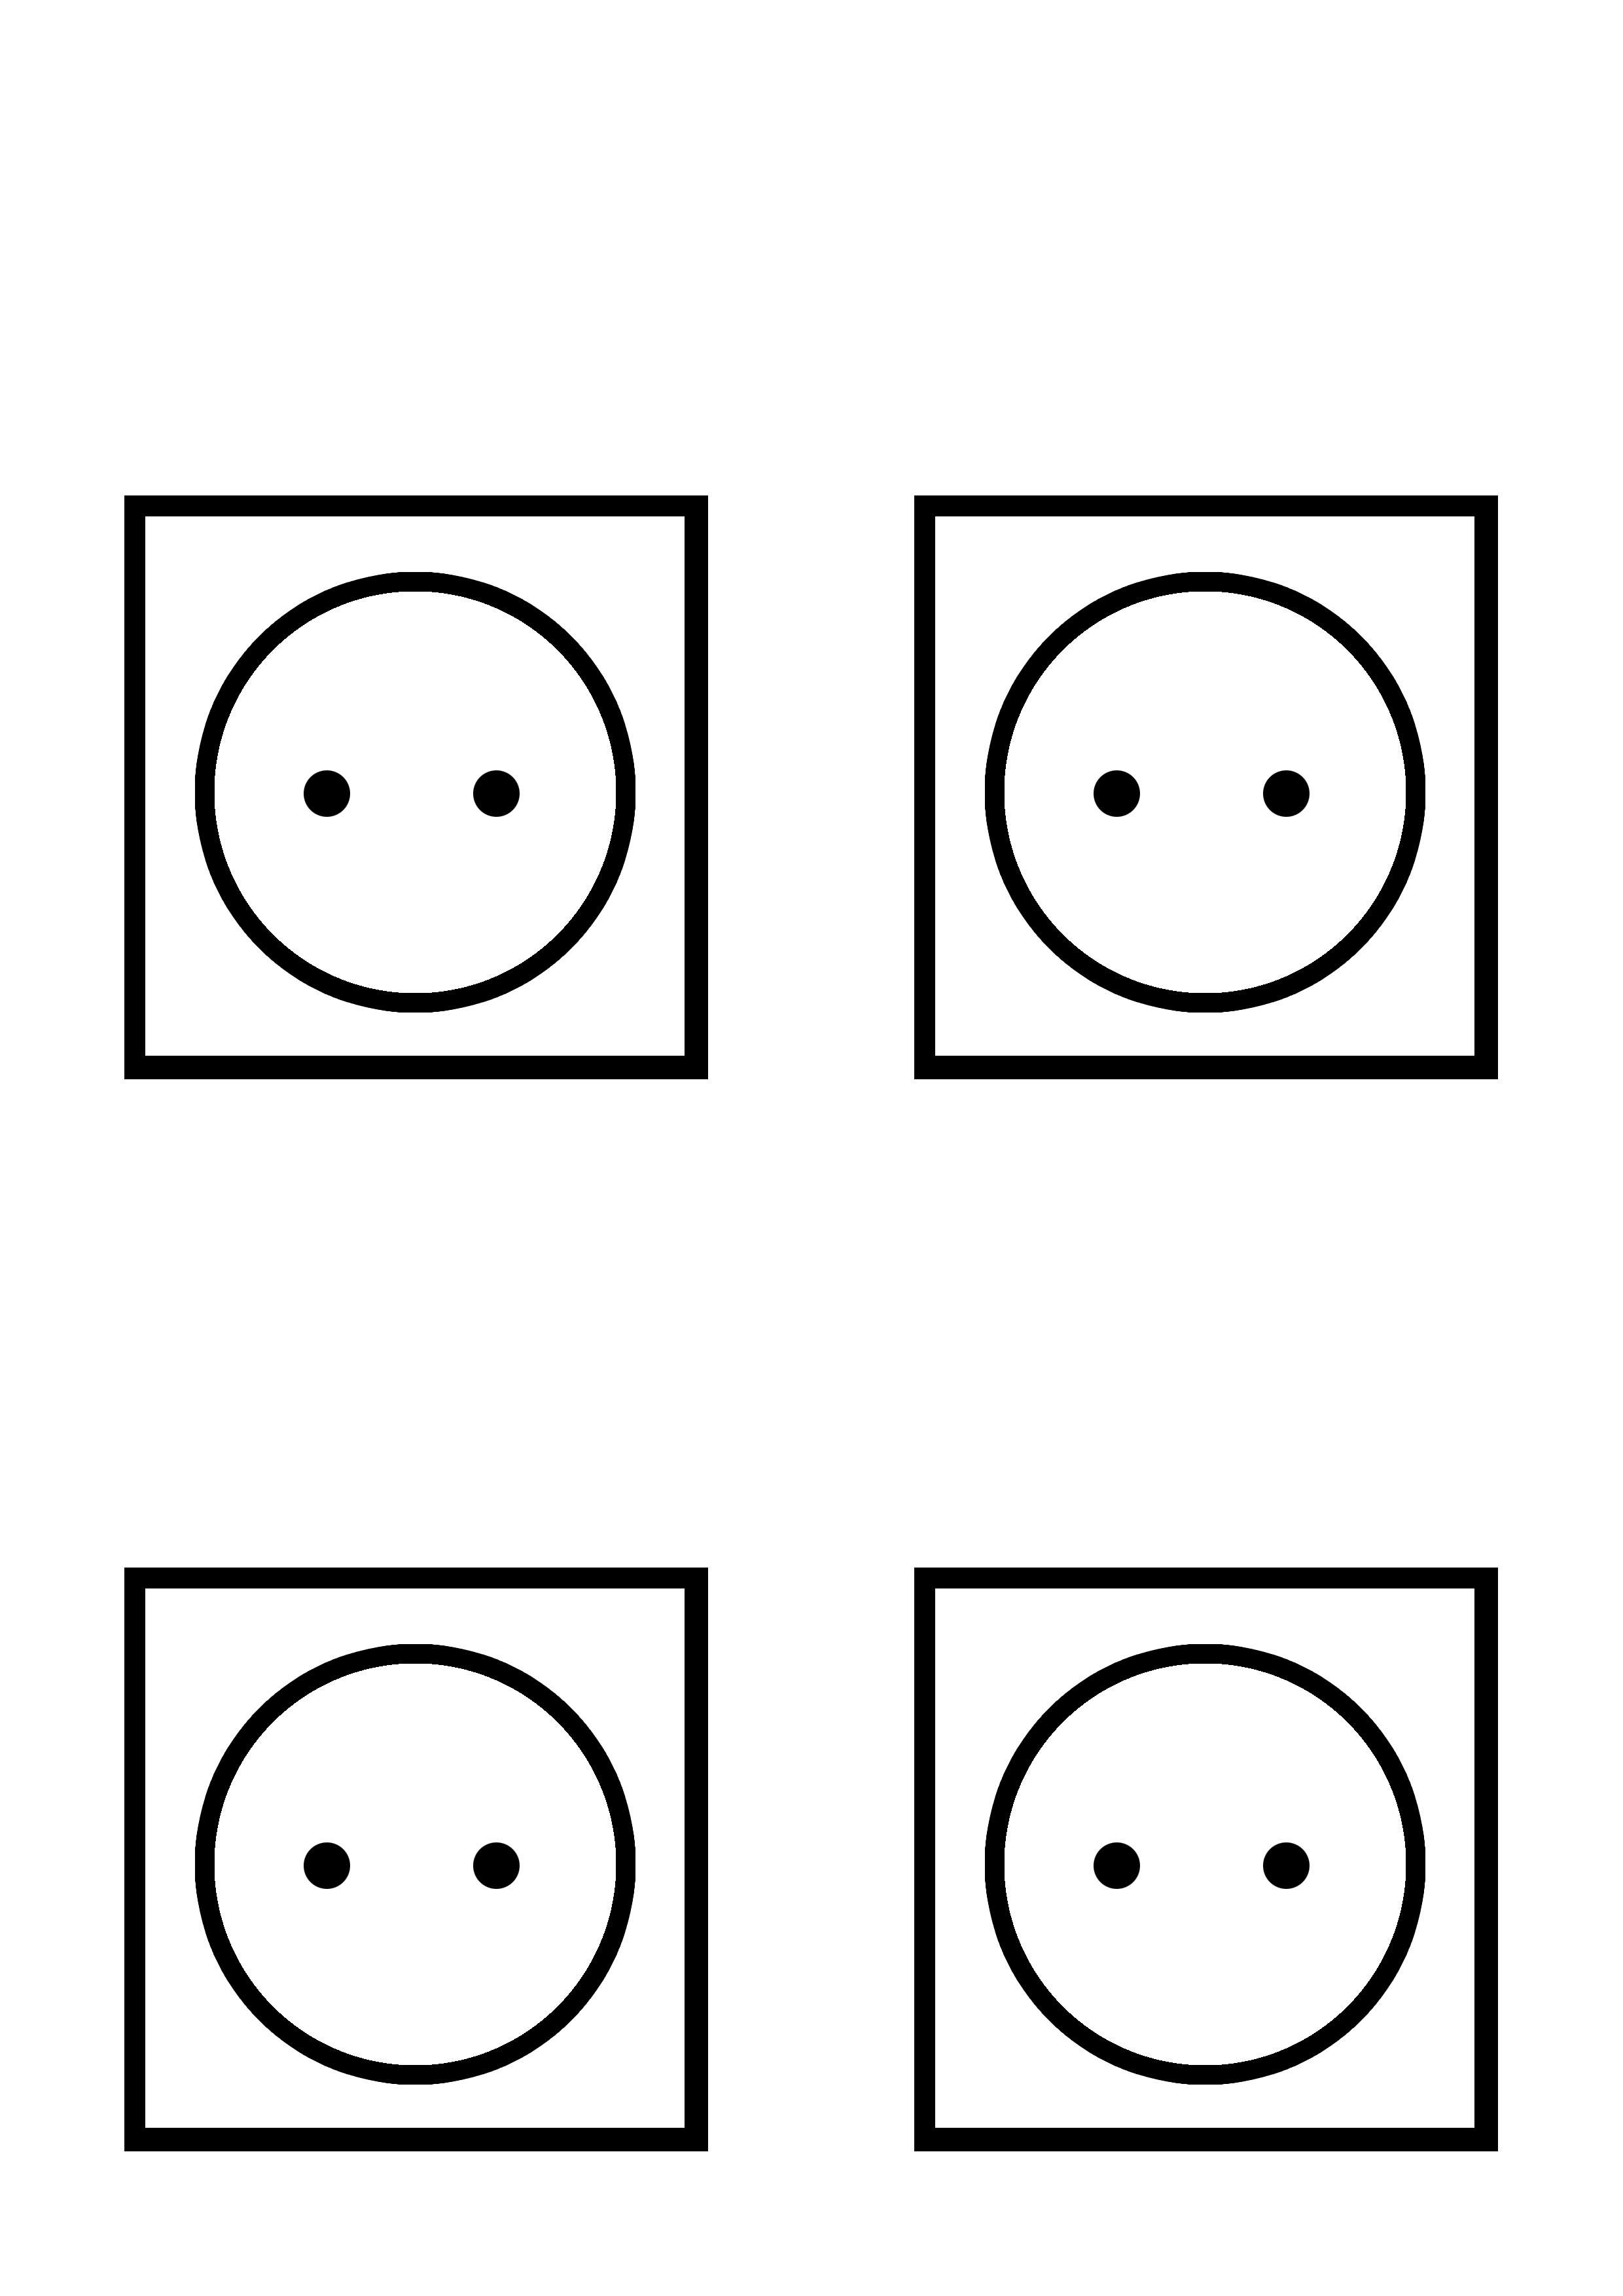 Prises simples